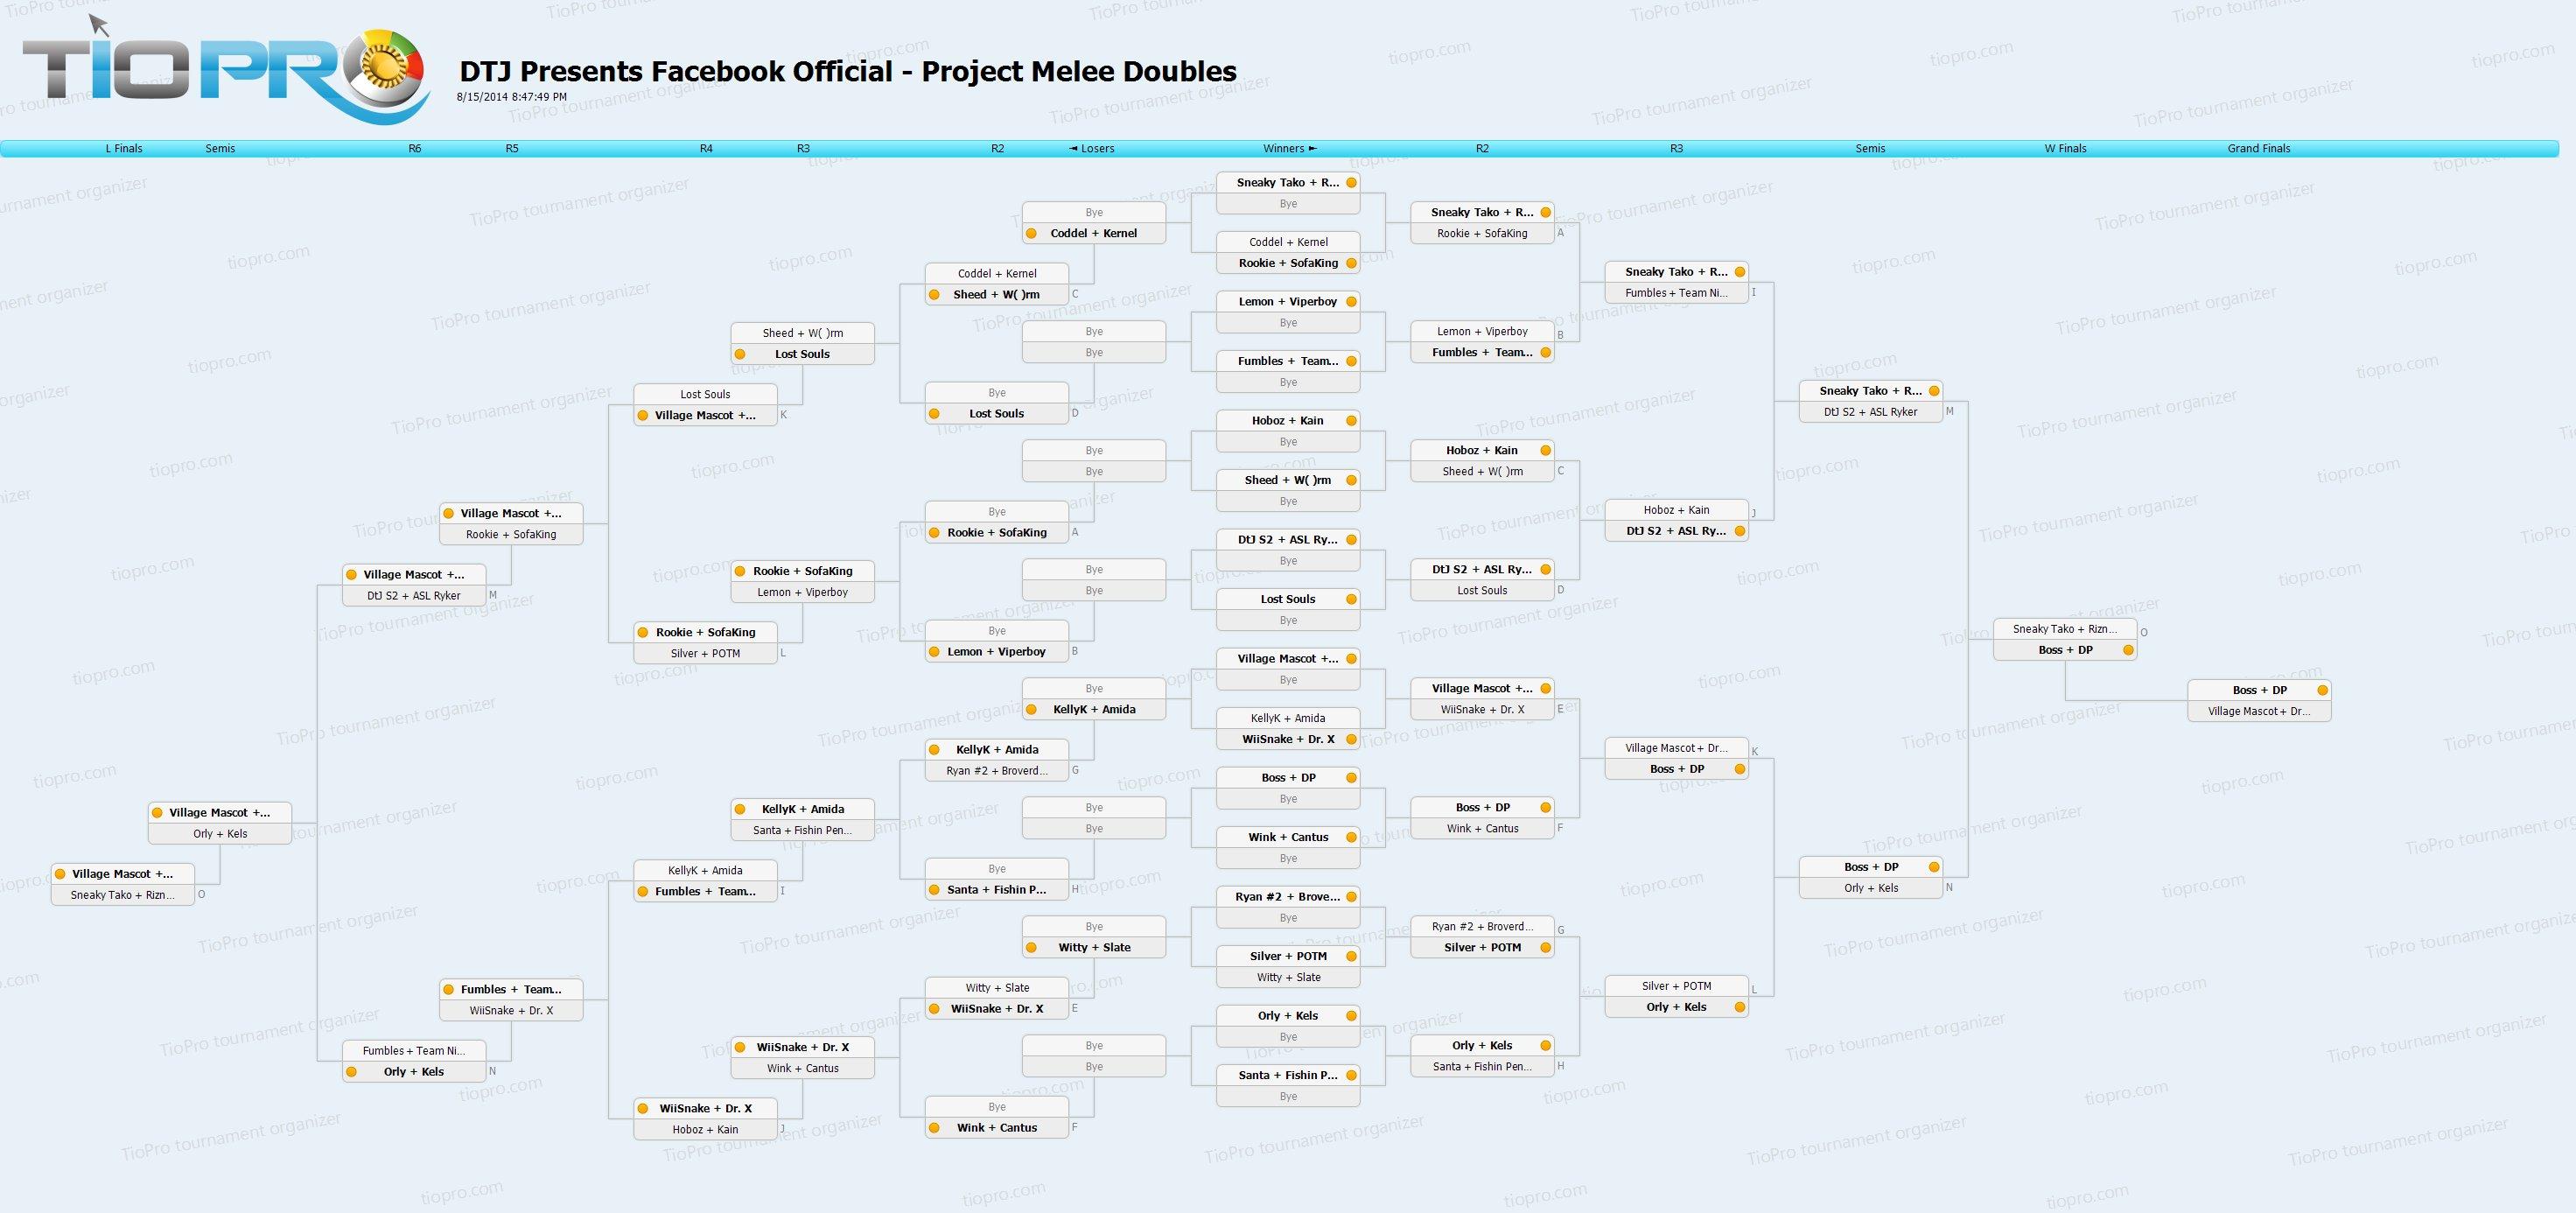 DtJ Presents: Facebook Official - Project M Doubles